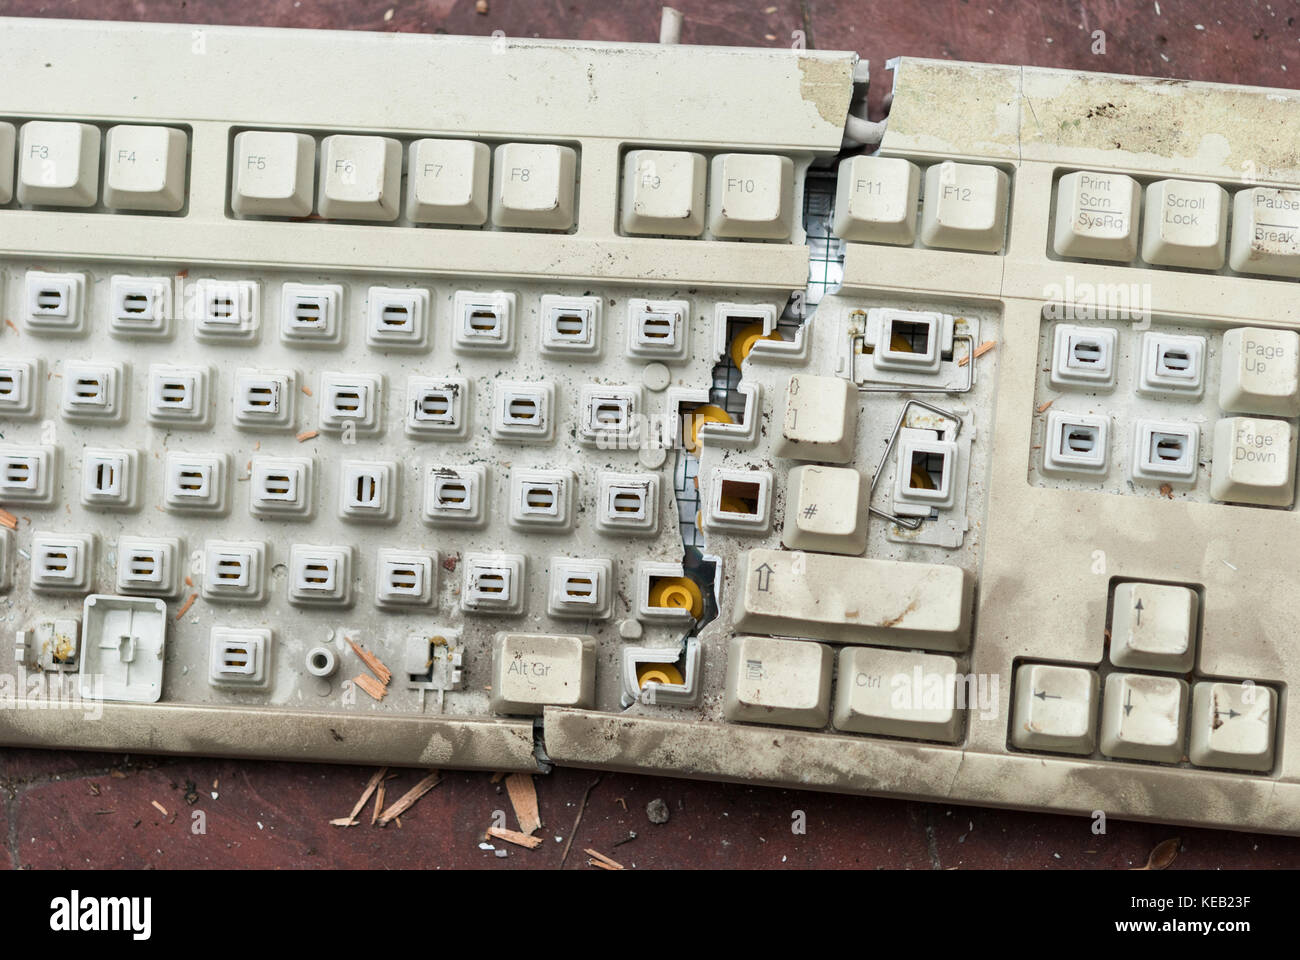 Electronic Scrap Keyboard Stock Photos Computer Diagram Kids Keyboards For Old Broken Pc Image